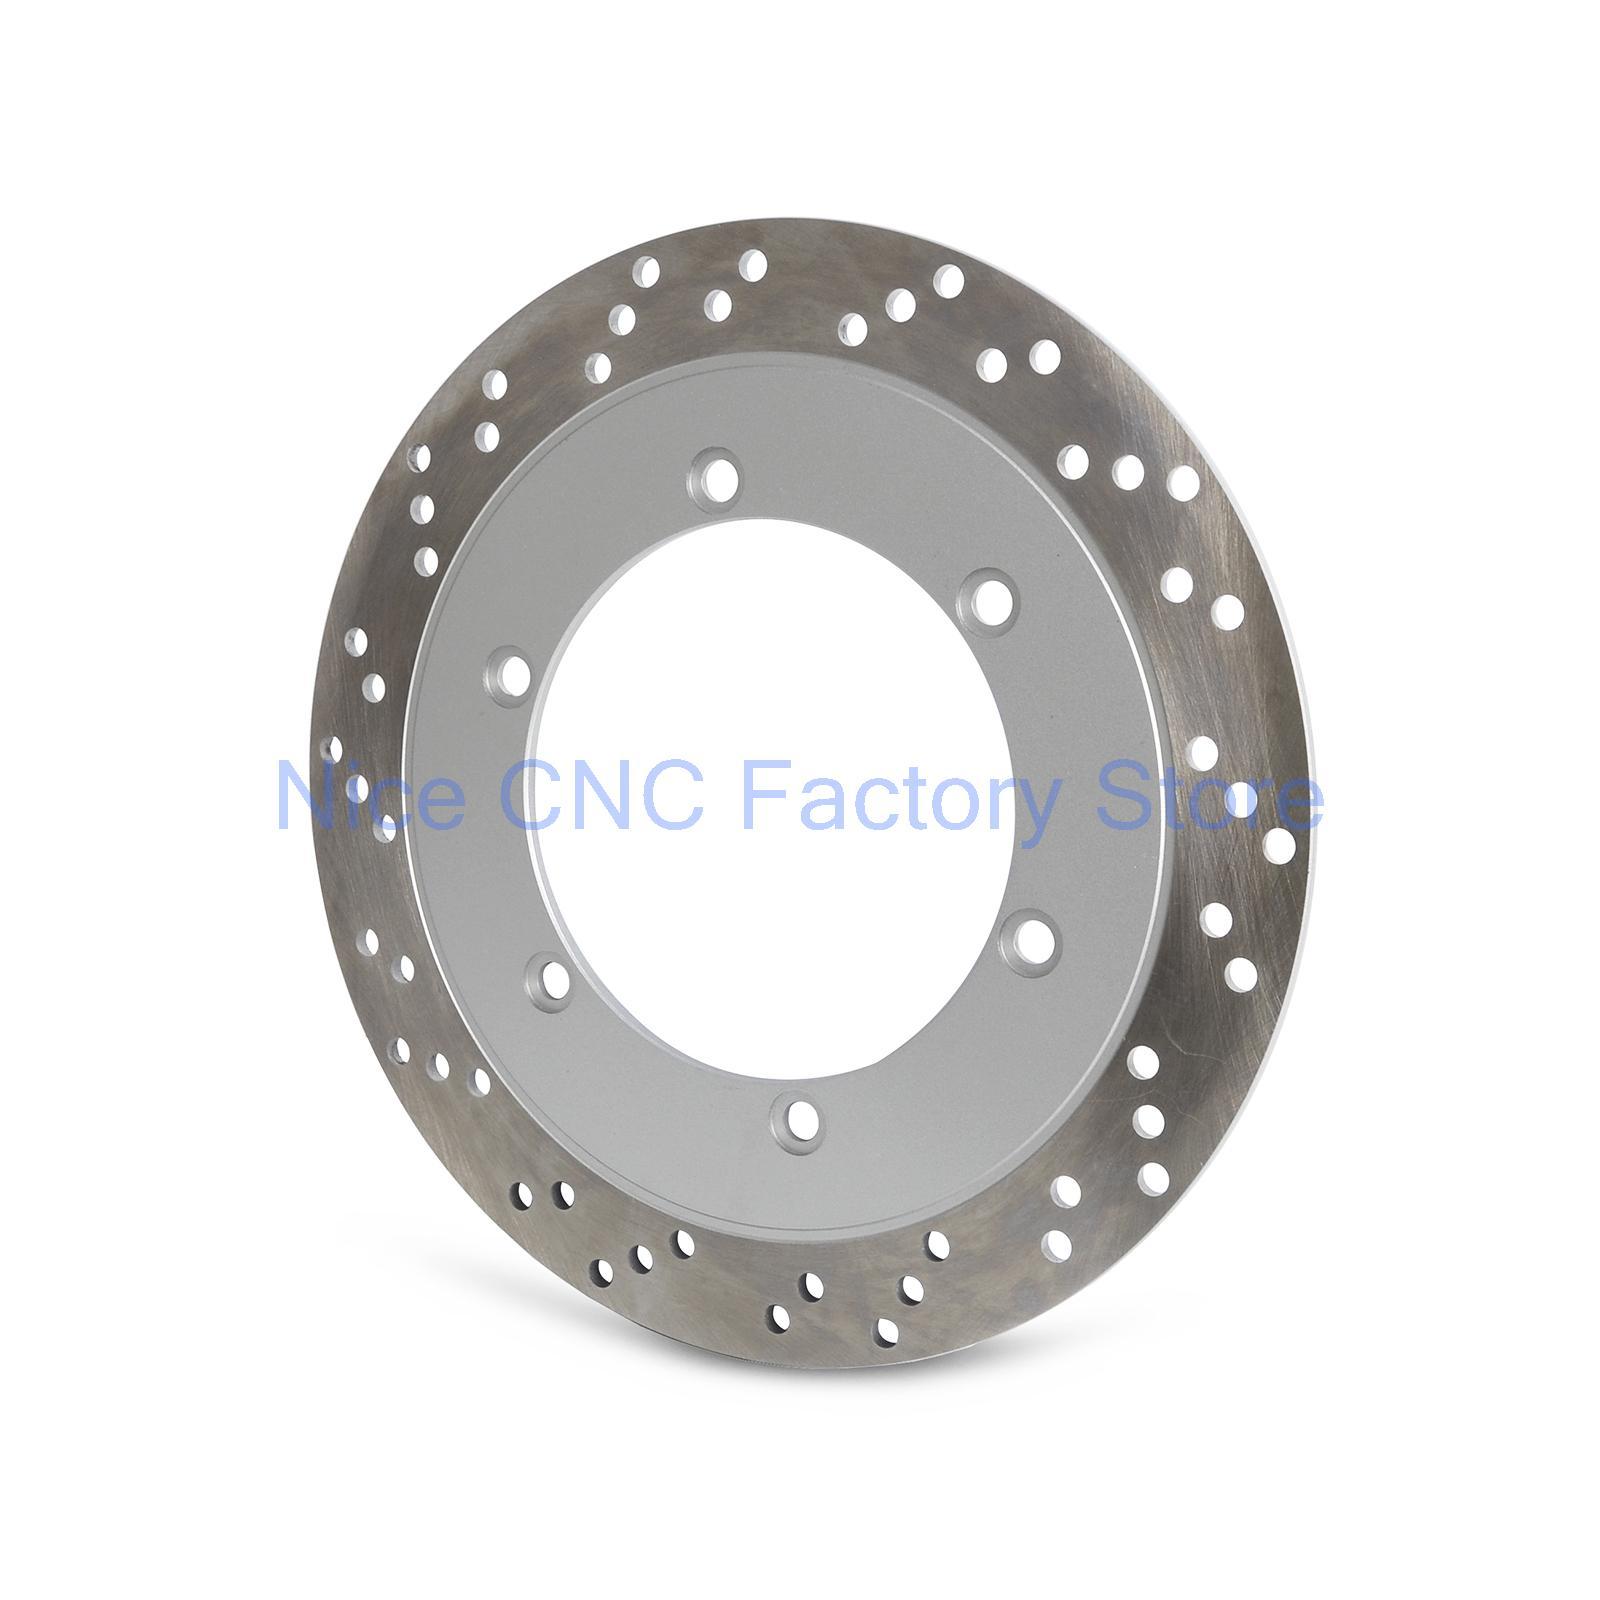 Motorcycle Parts Rear Brake Disc Rotor For Honda VTX1300 S3/S4/S5/S6/S7/S8 2003 - 2008 2004 2005 2006 2007 NEW